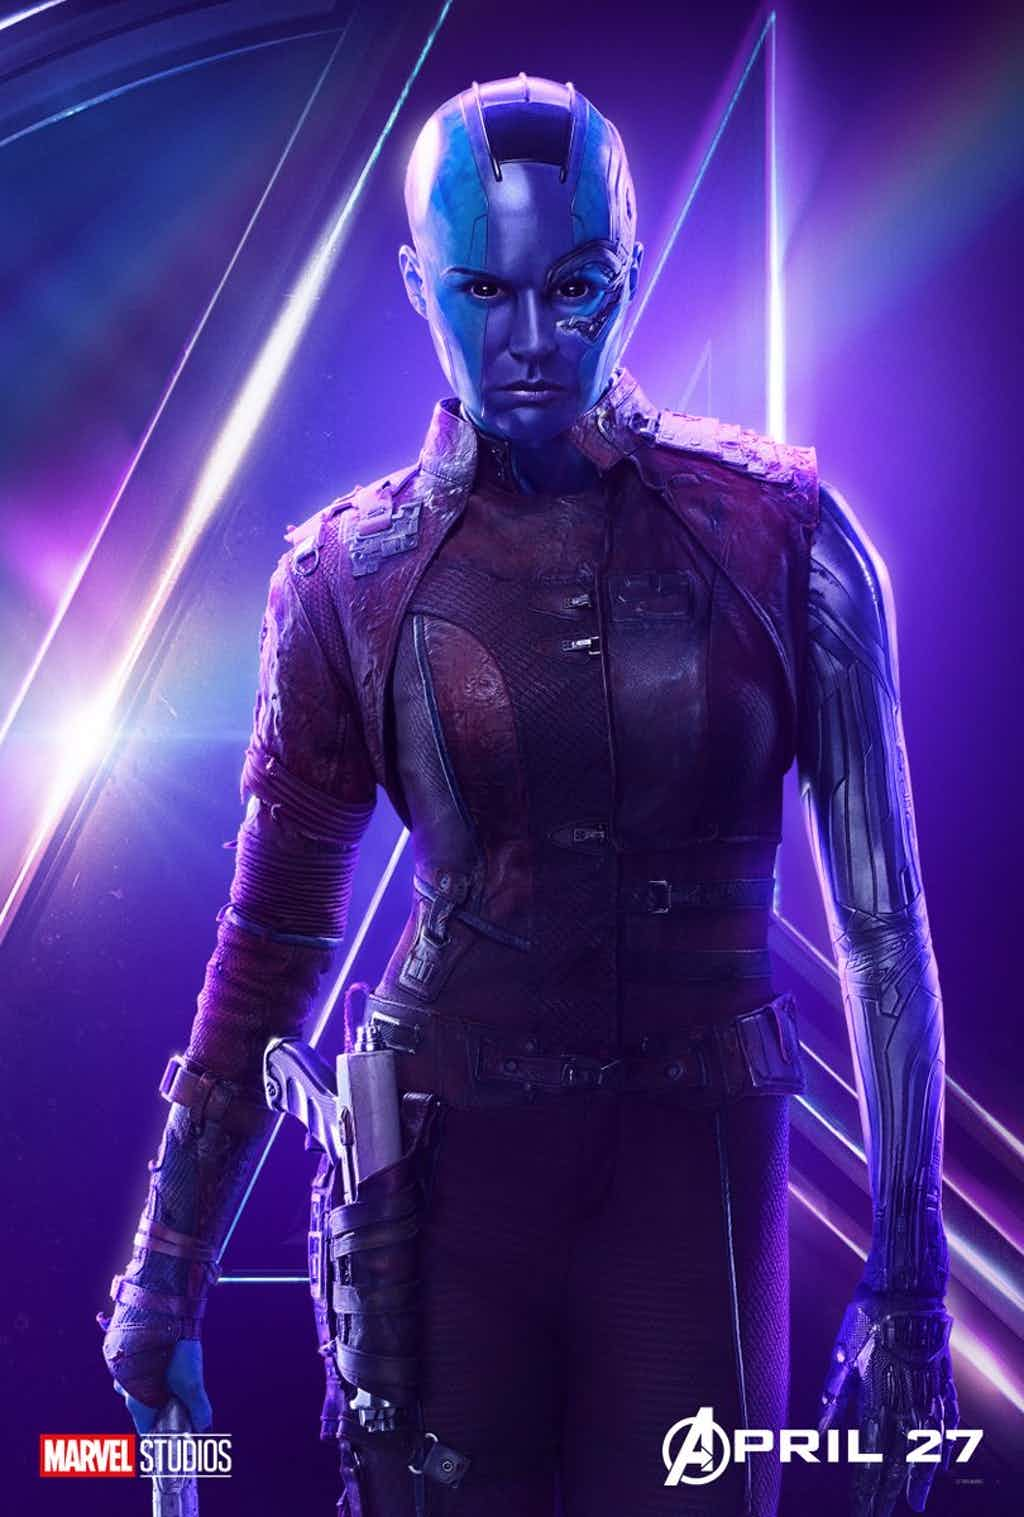 szmk_marvel_infinity_war_vegtelen_haboru_bosszuallok_avengers_ironman_hulk_thor_captainamaerica_guardians_galaxy_11.jpg